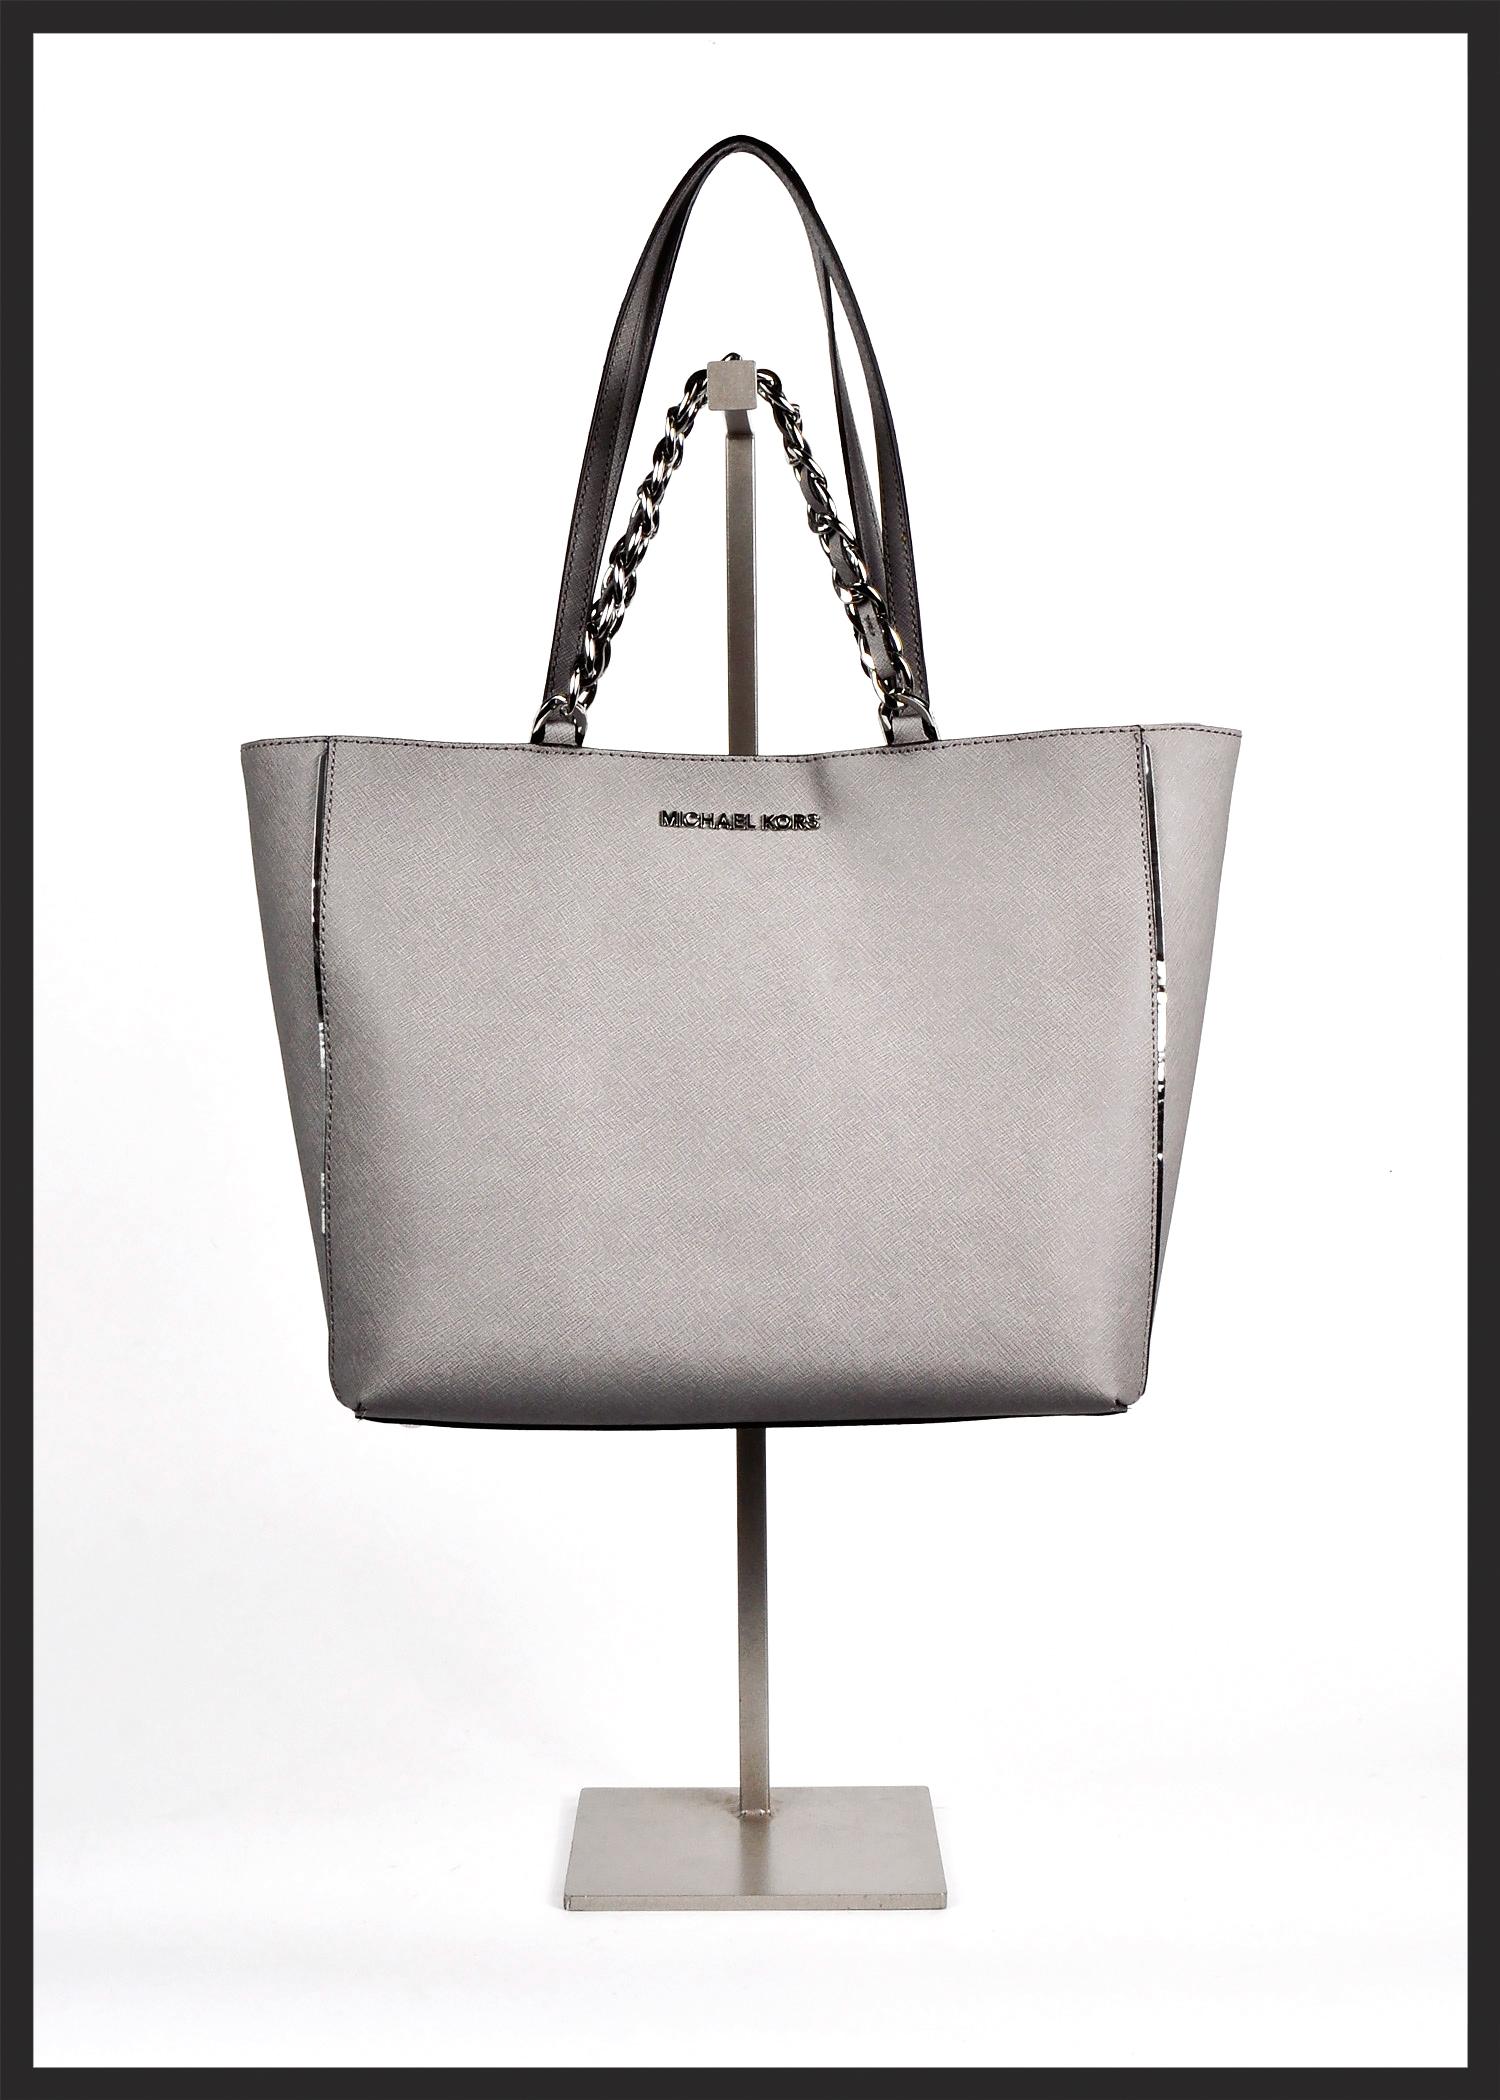 Silvery Sleek Michael Kors Bag